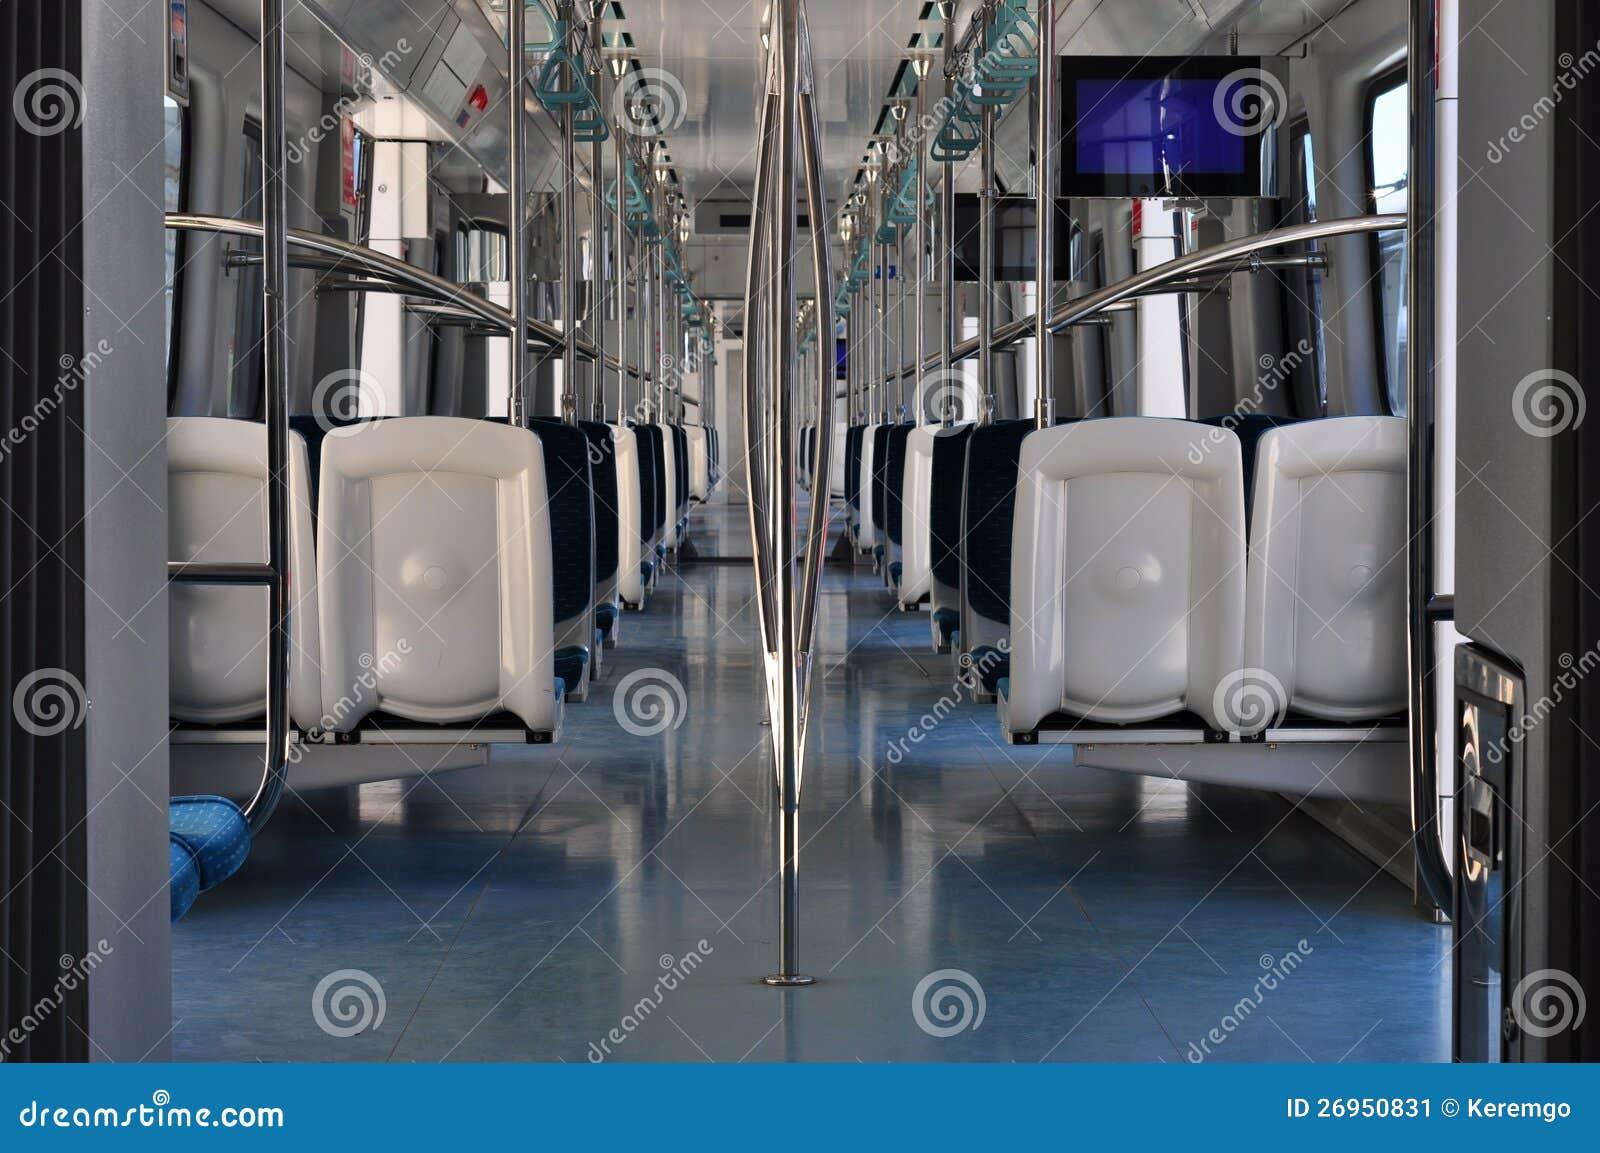 subway interior stock image image 26950831. Black Bedroom Furniture Sets. Home Design Ideas